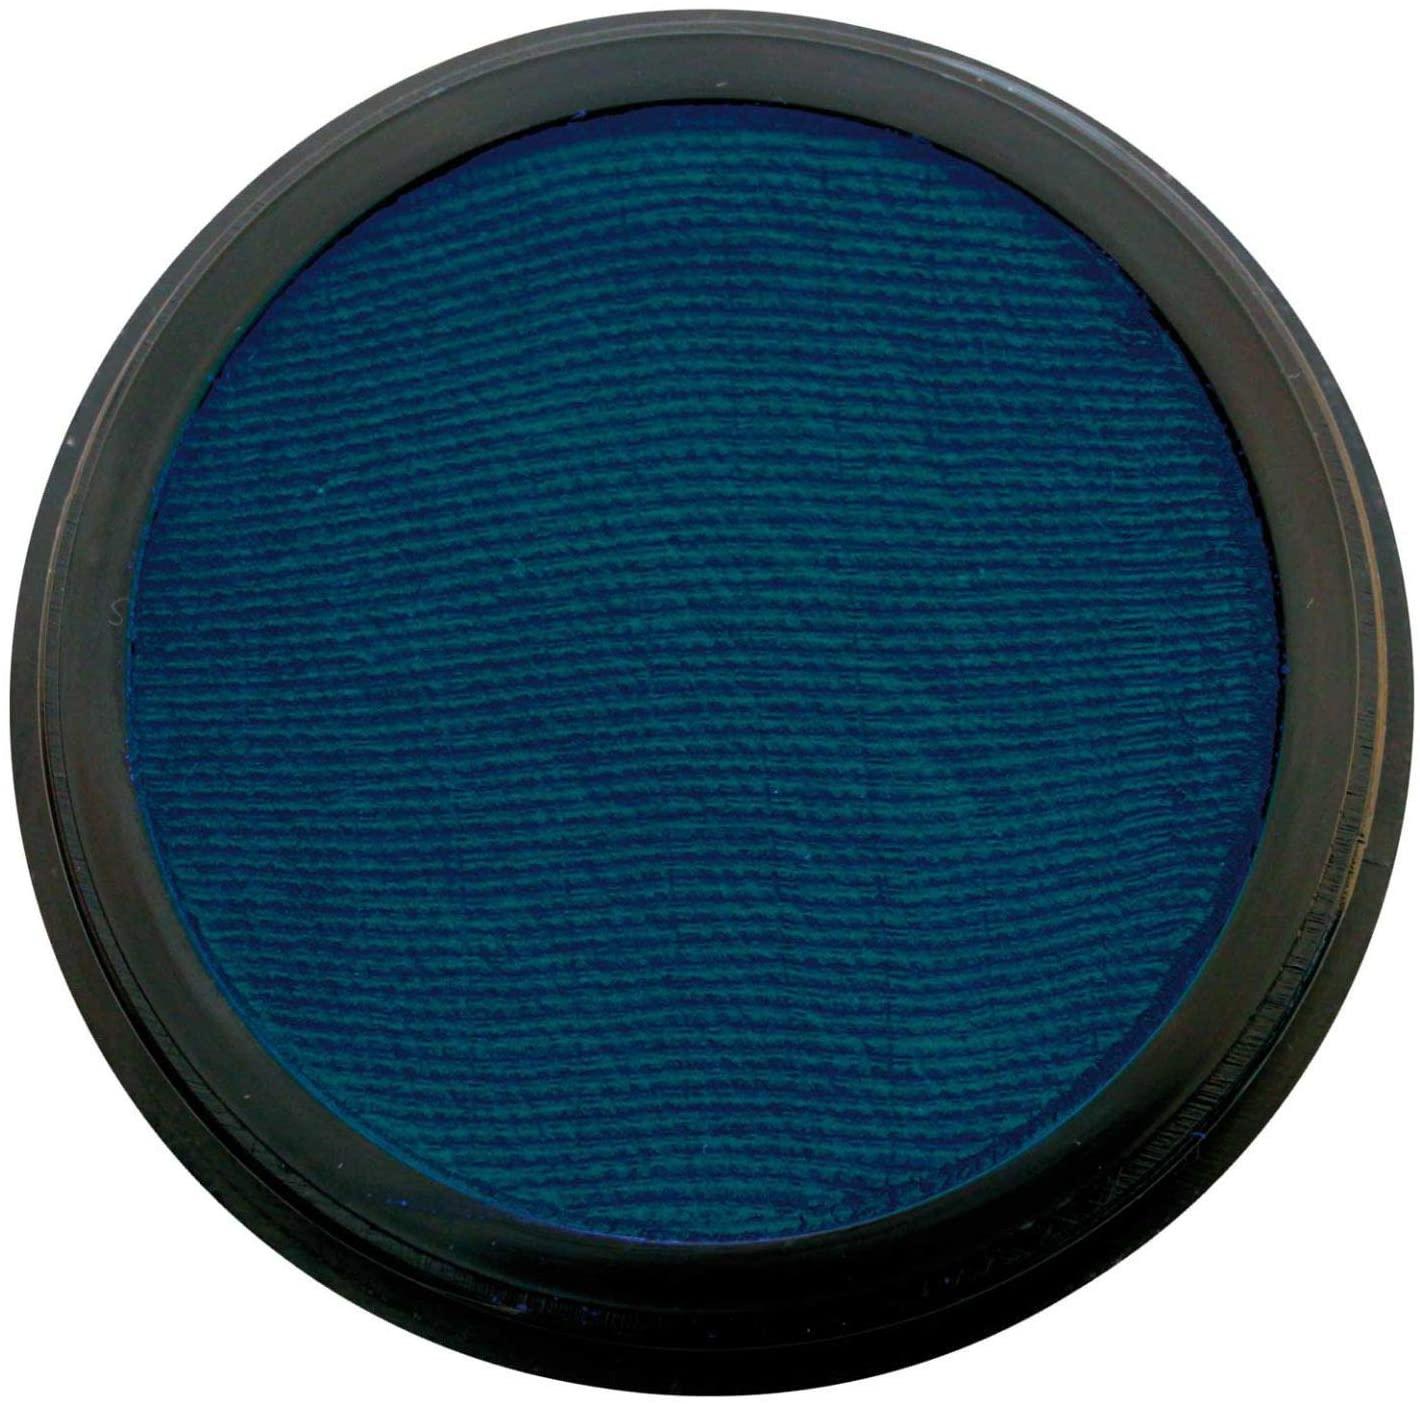 Eulenspiegel 183335 20 ml/30 g Professional Aqua Make-Up